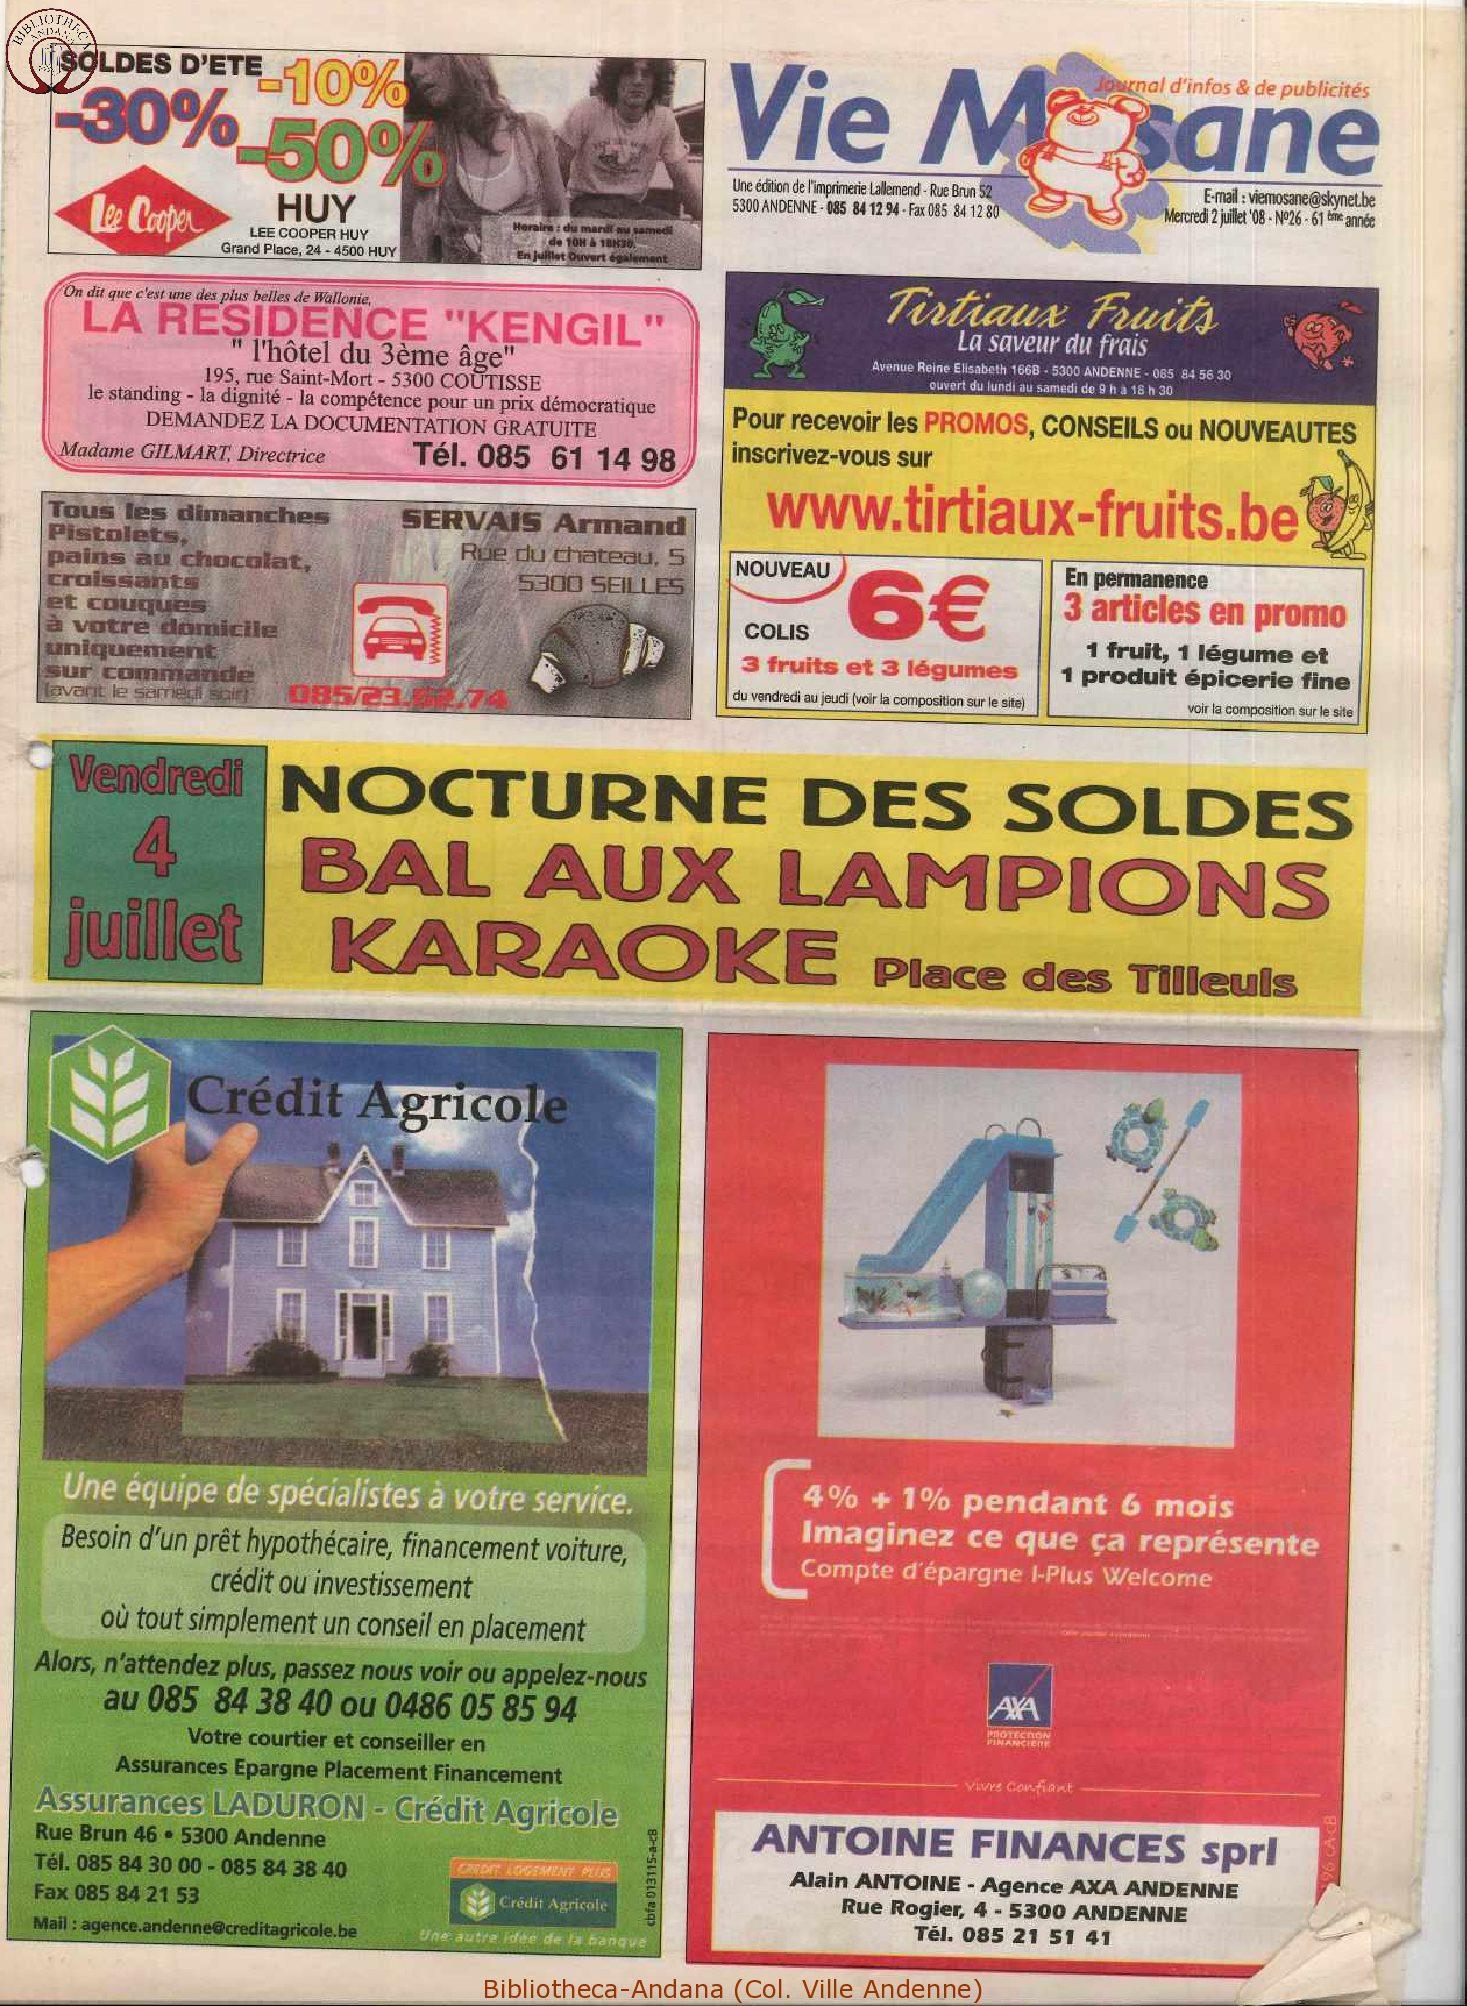 61e année - n°26 - 2 juillet 2008